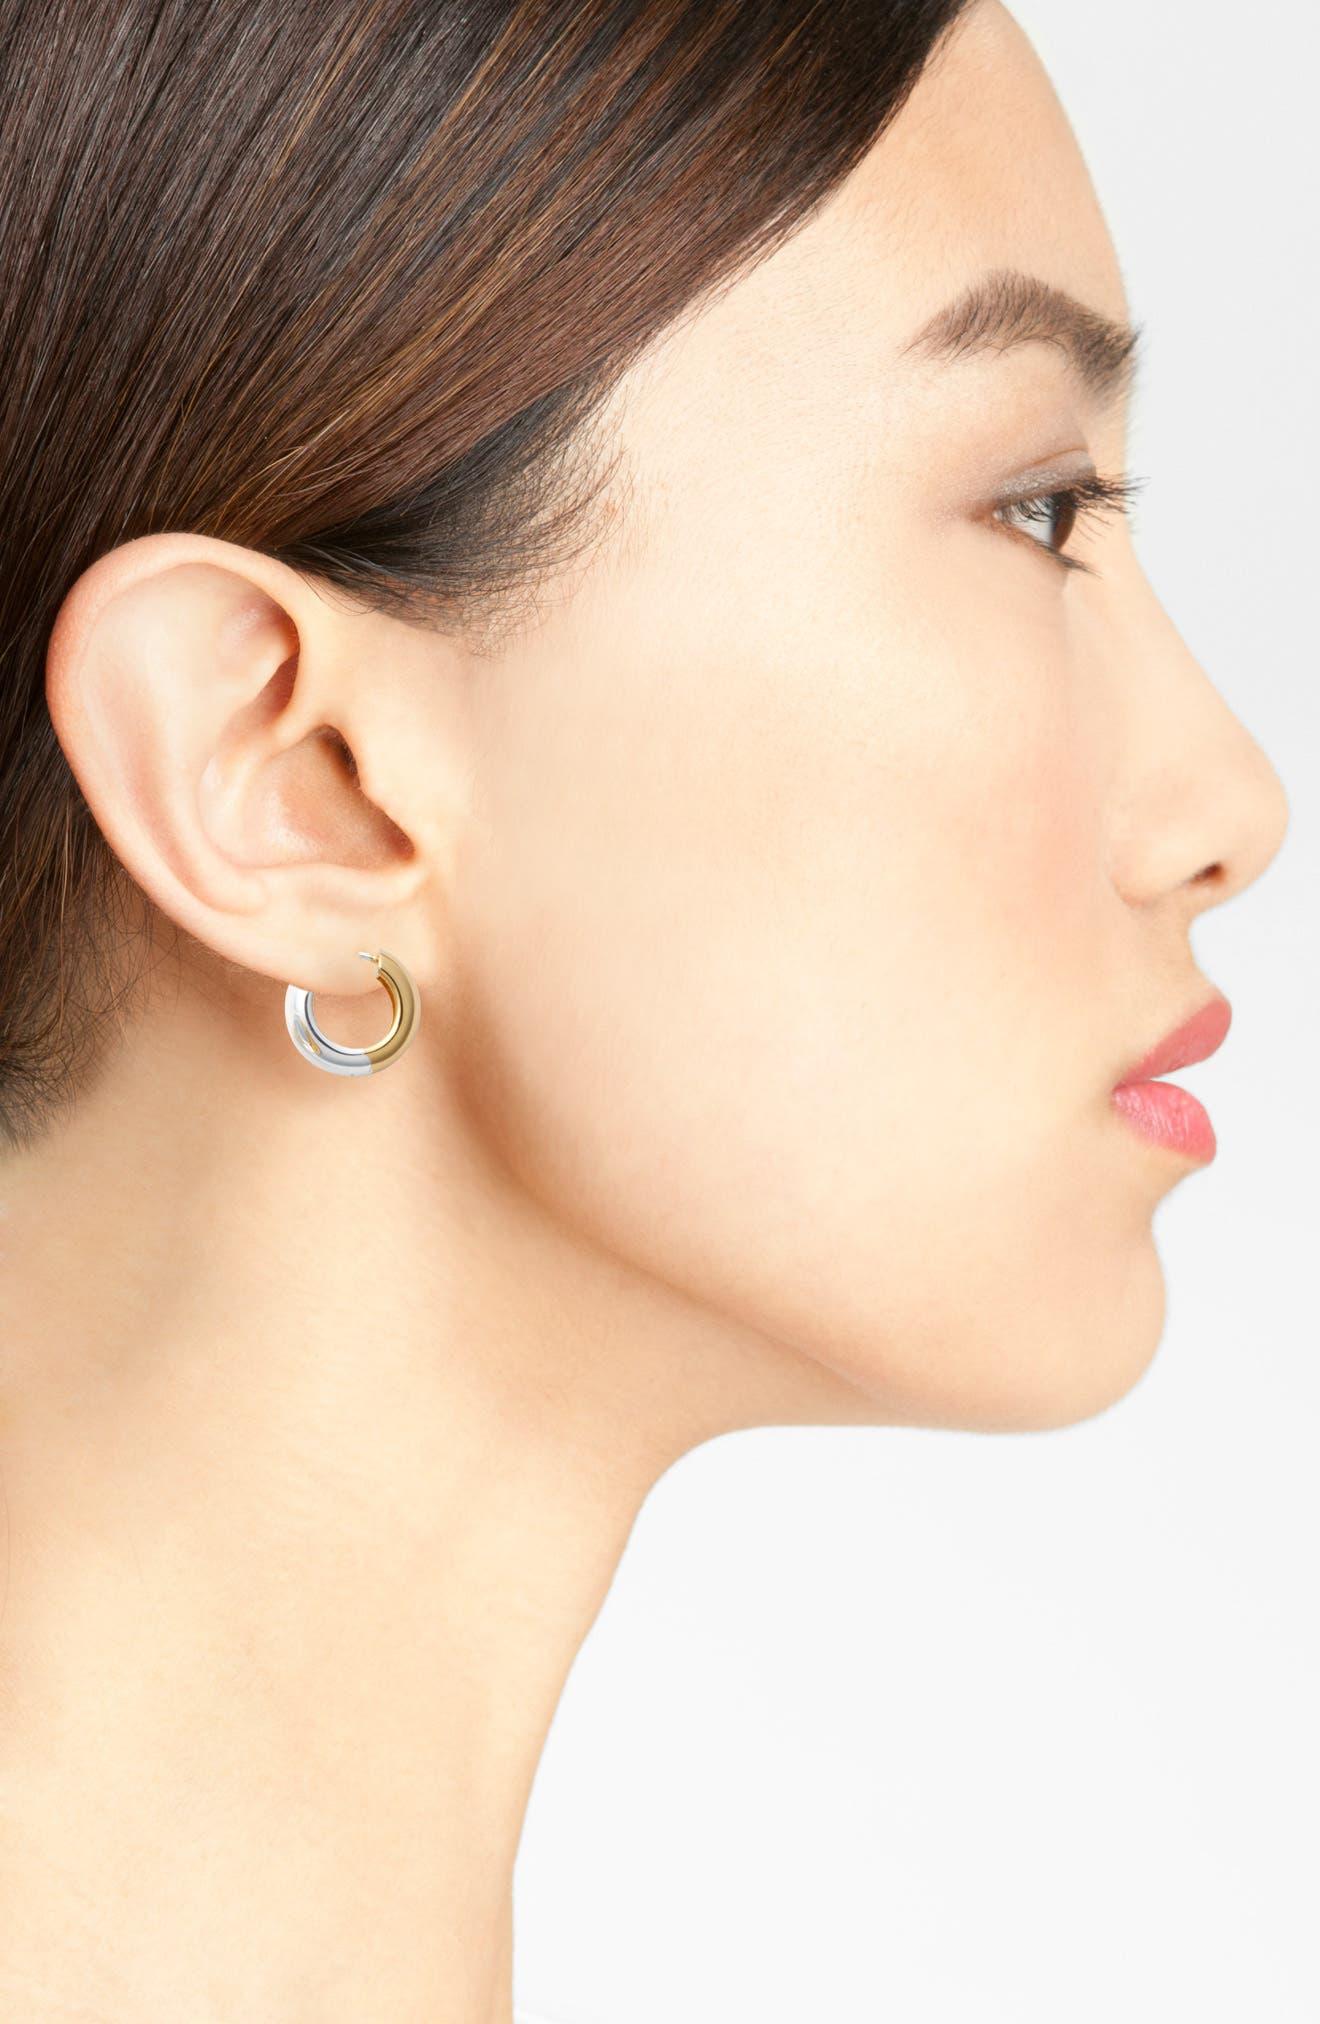 Hoop Earrings,                             Alternate thumbnail 2, color,                             SILVER/ GOLD